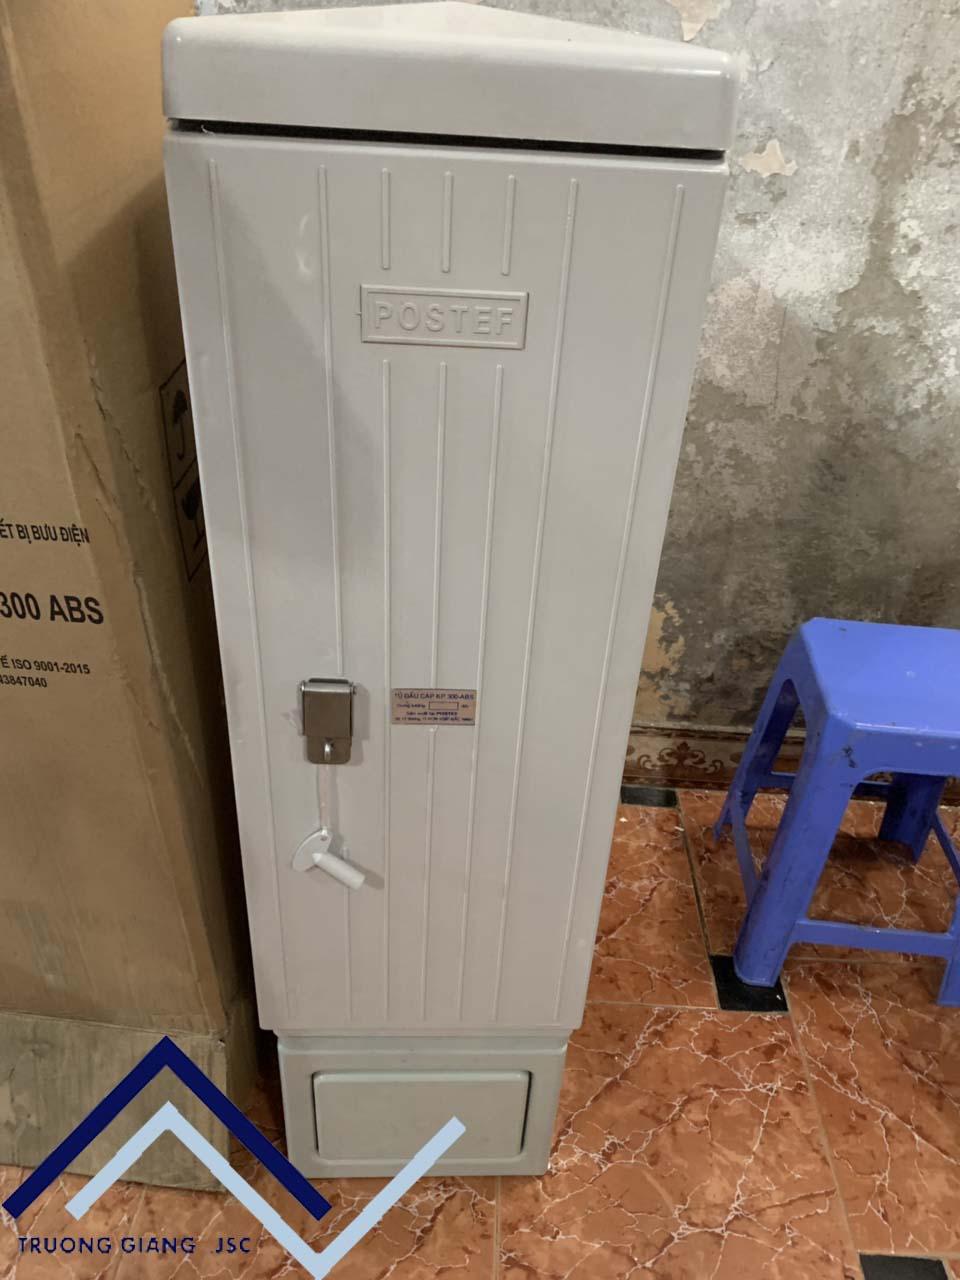 Vỏ tủ kp 300 Abs postef